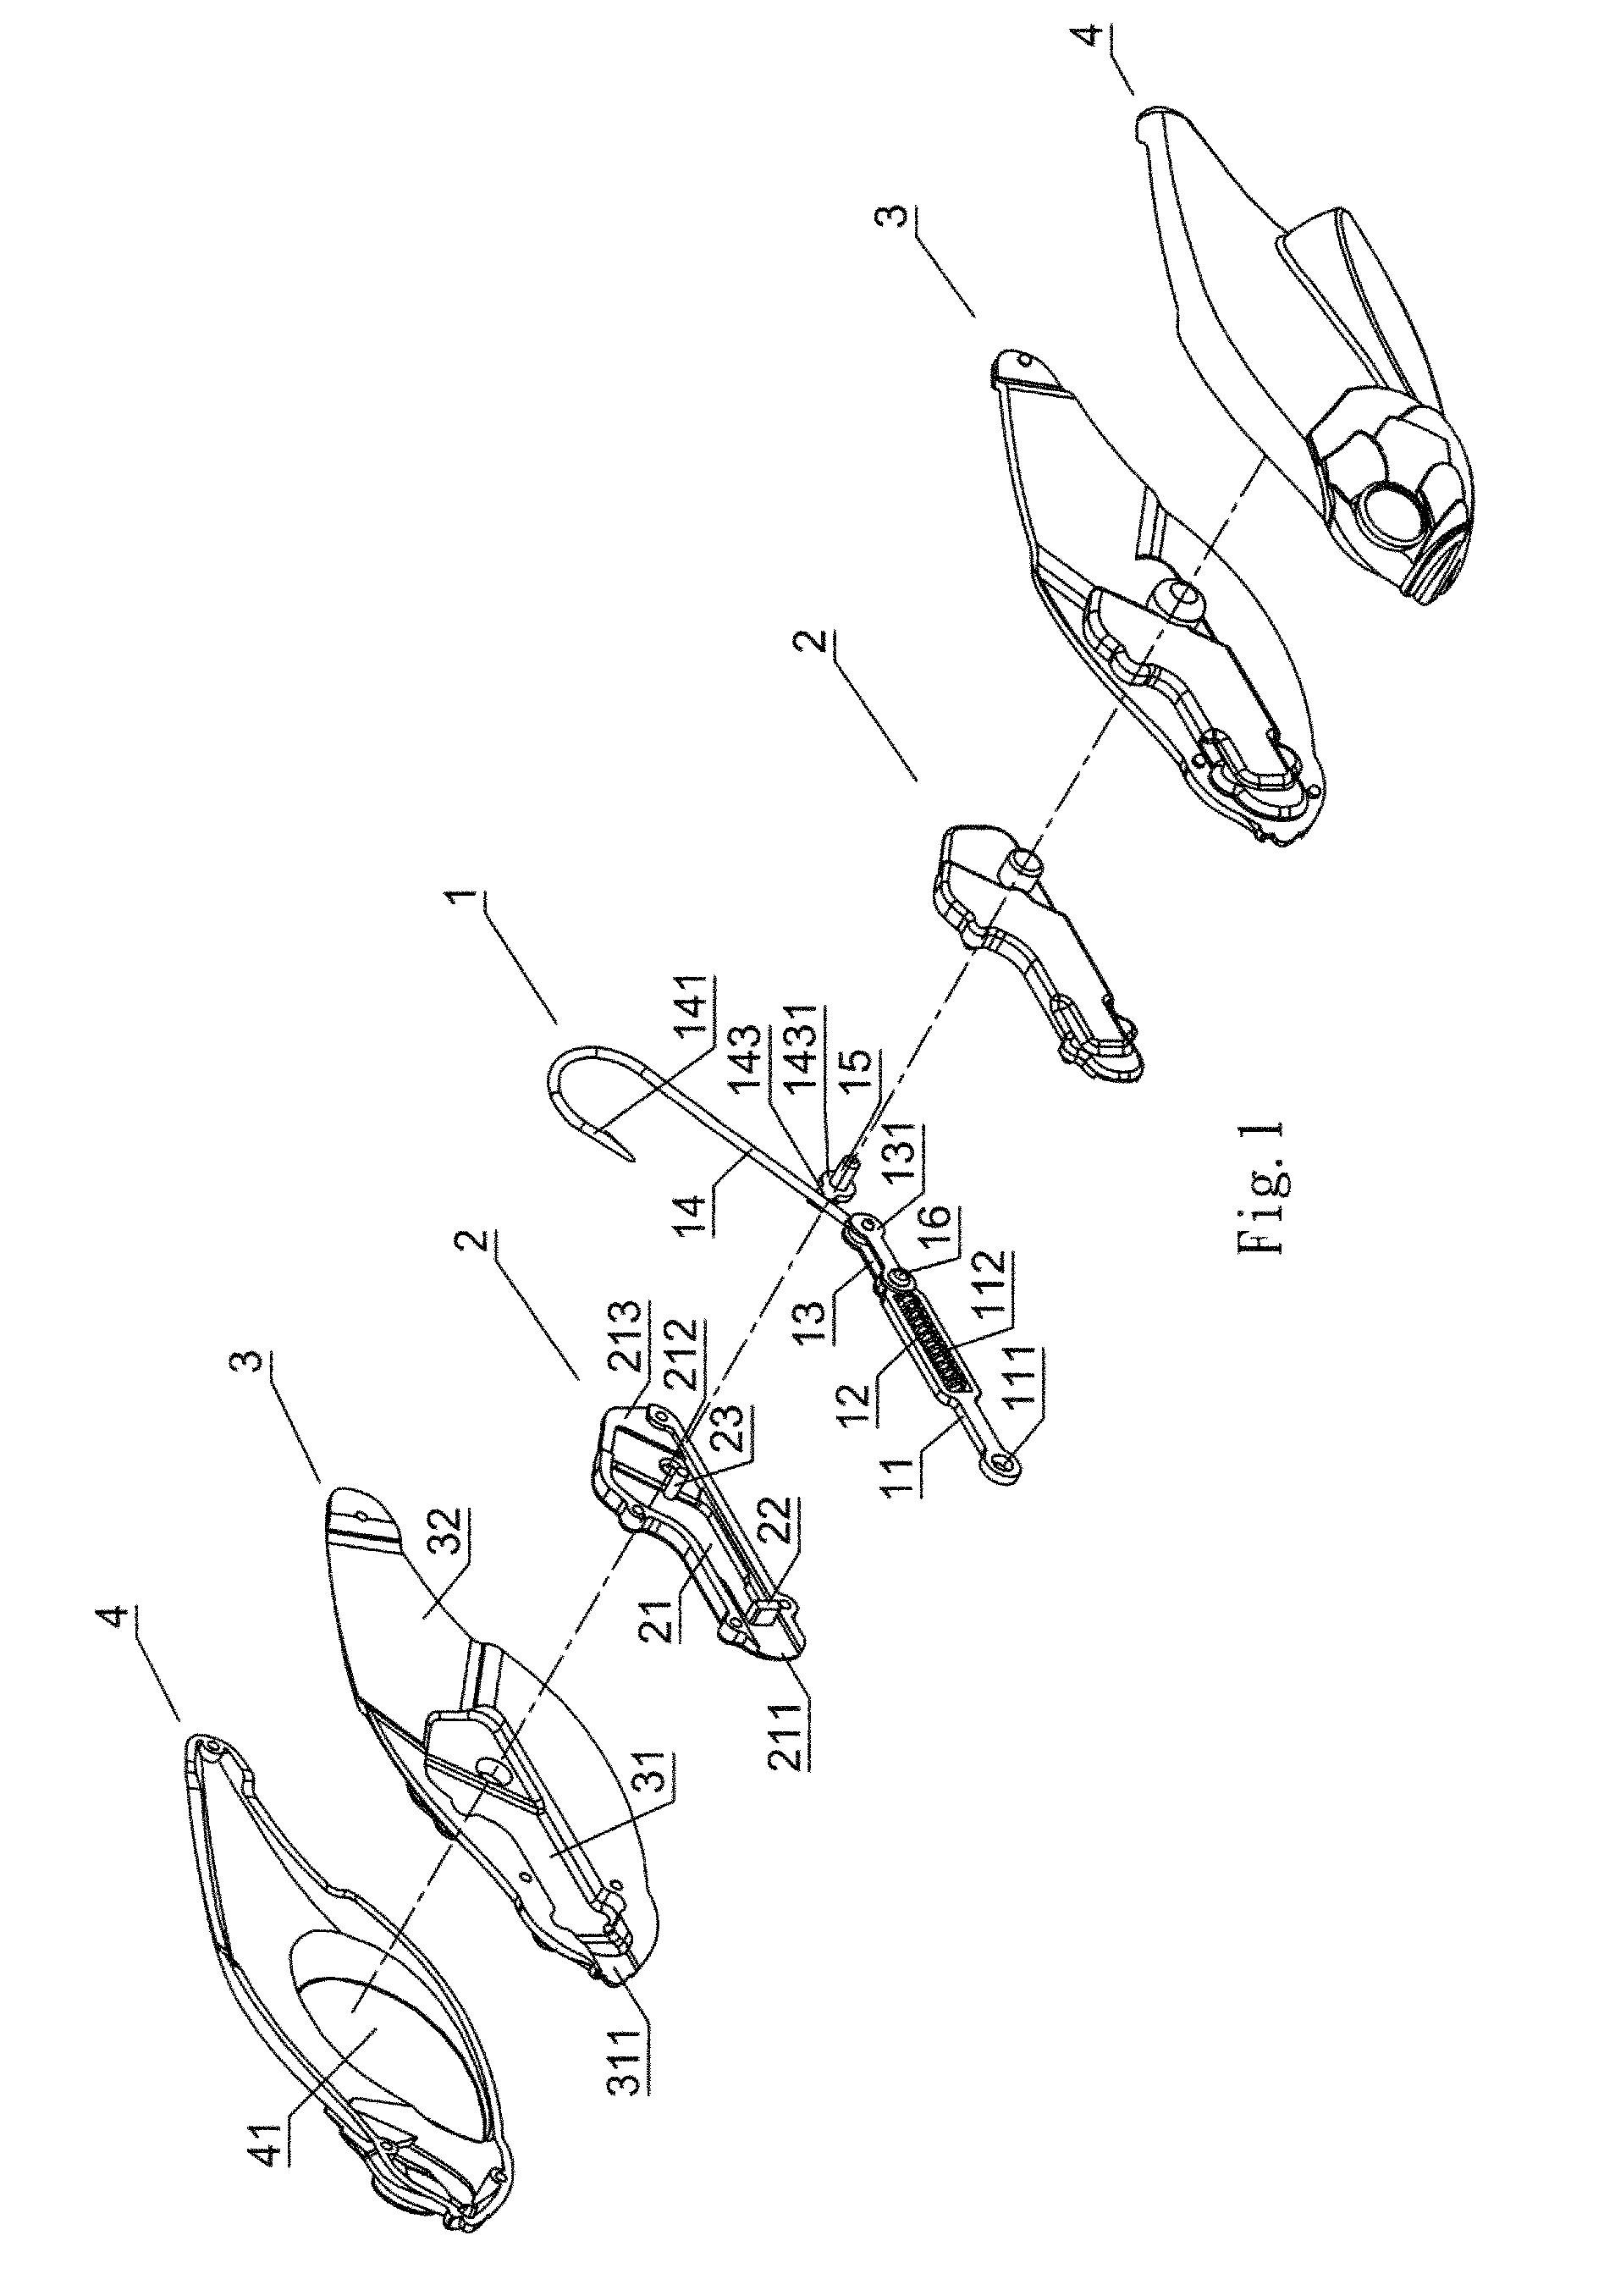 Pin on Fishing Patents